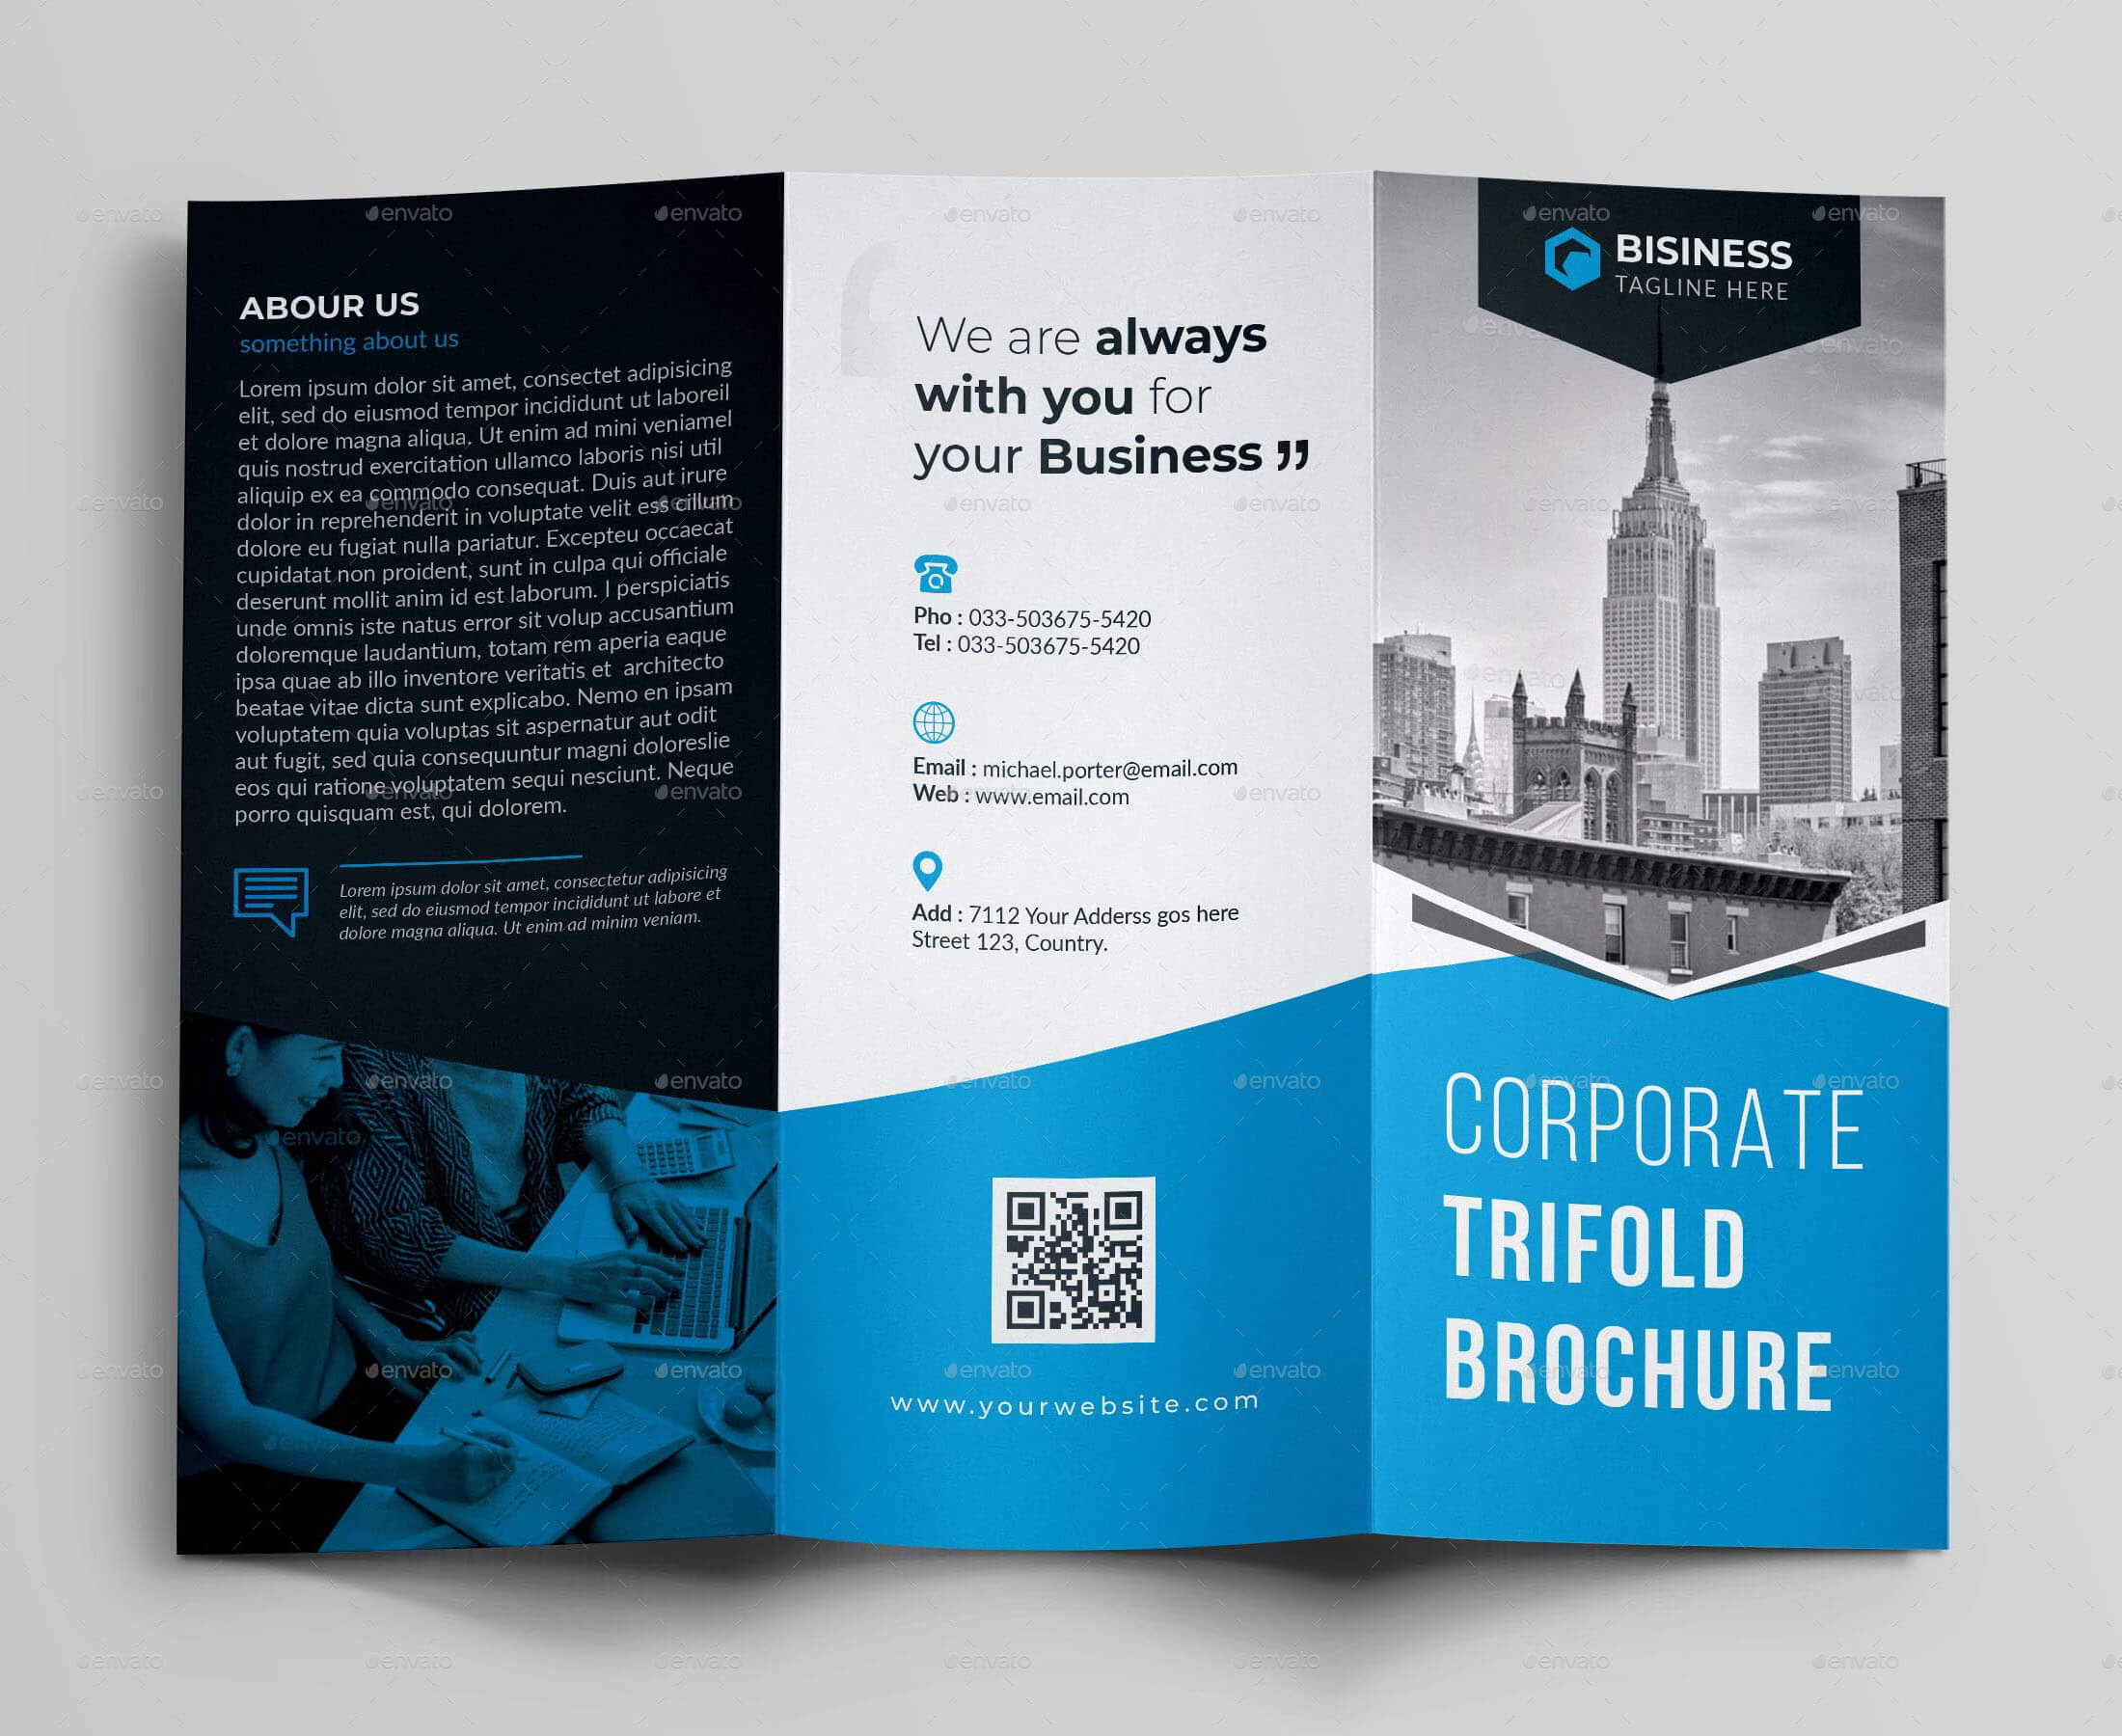 017 Template Ideas Corporate Brochure Templates Psd Free Inside Architecture Brochure Templates Free Download